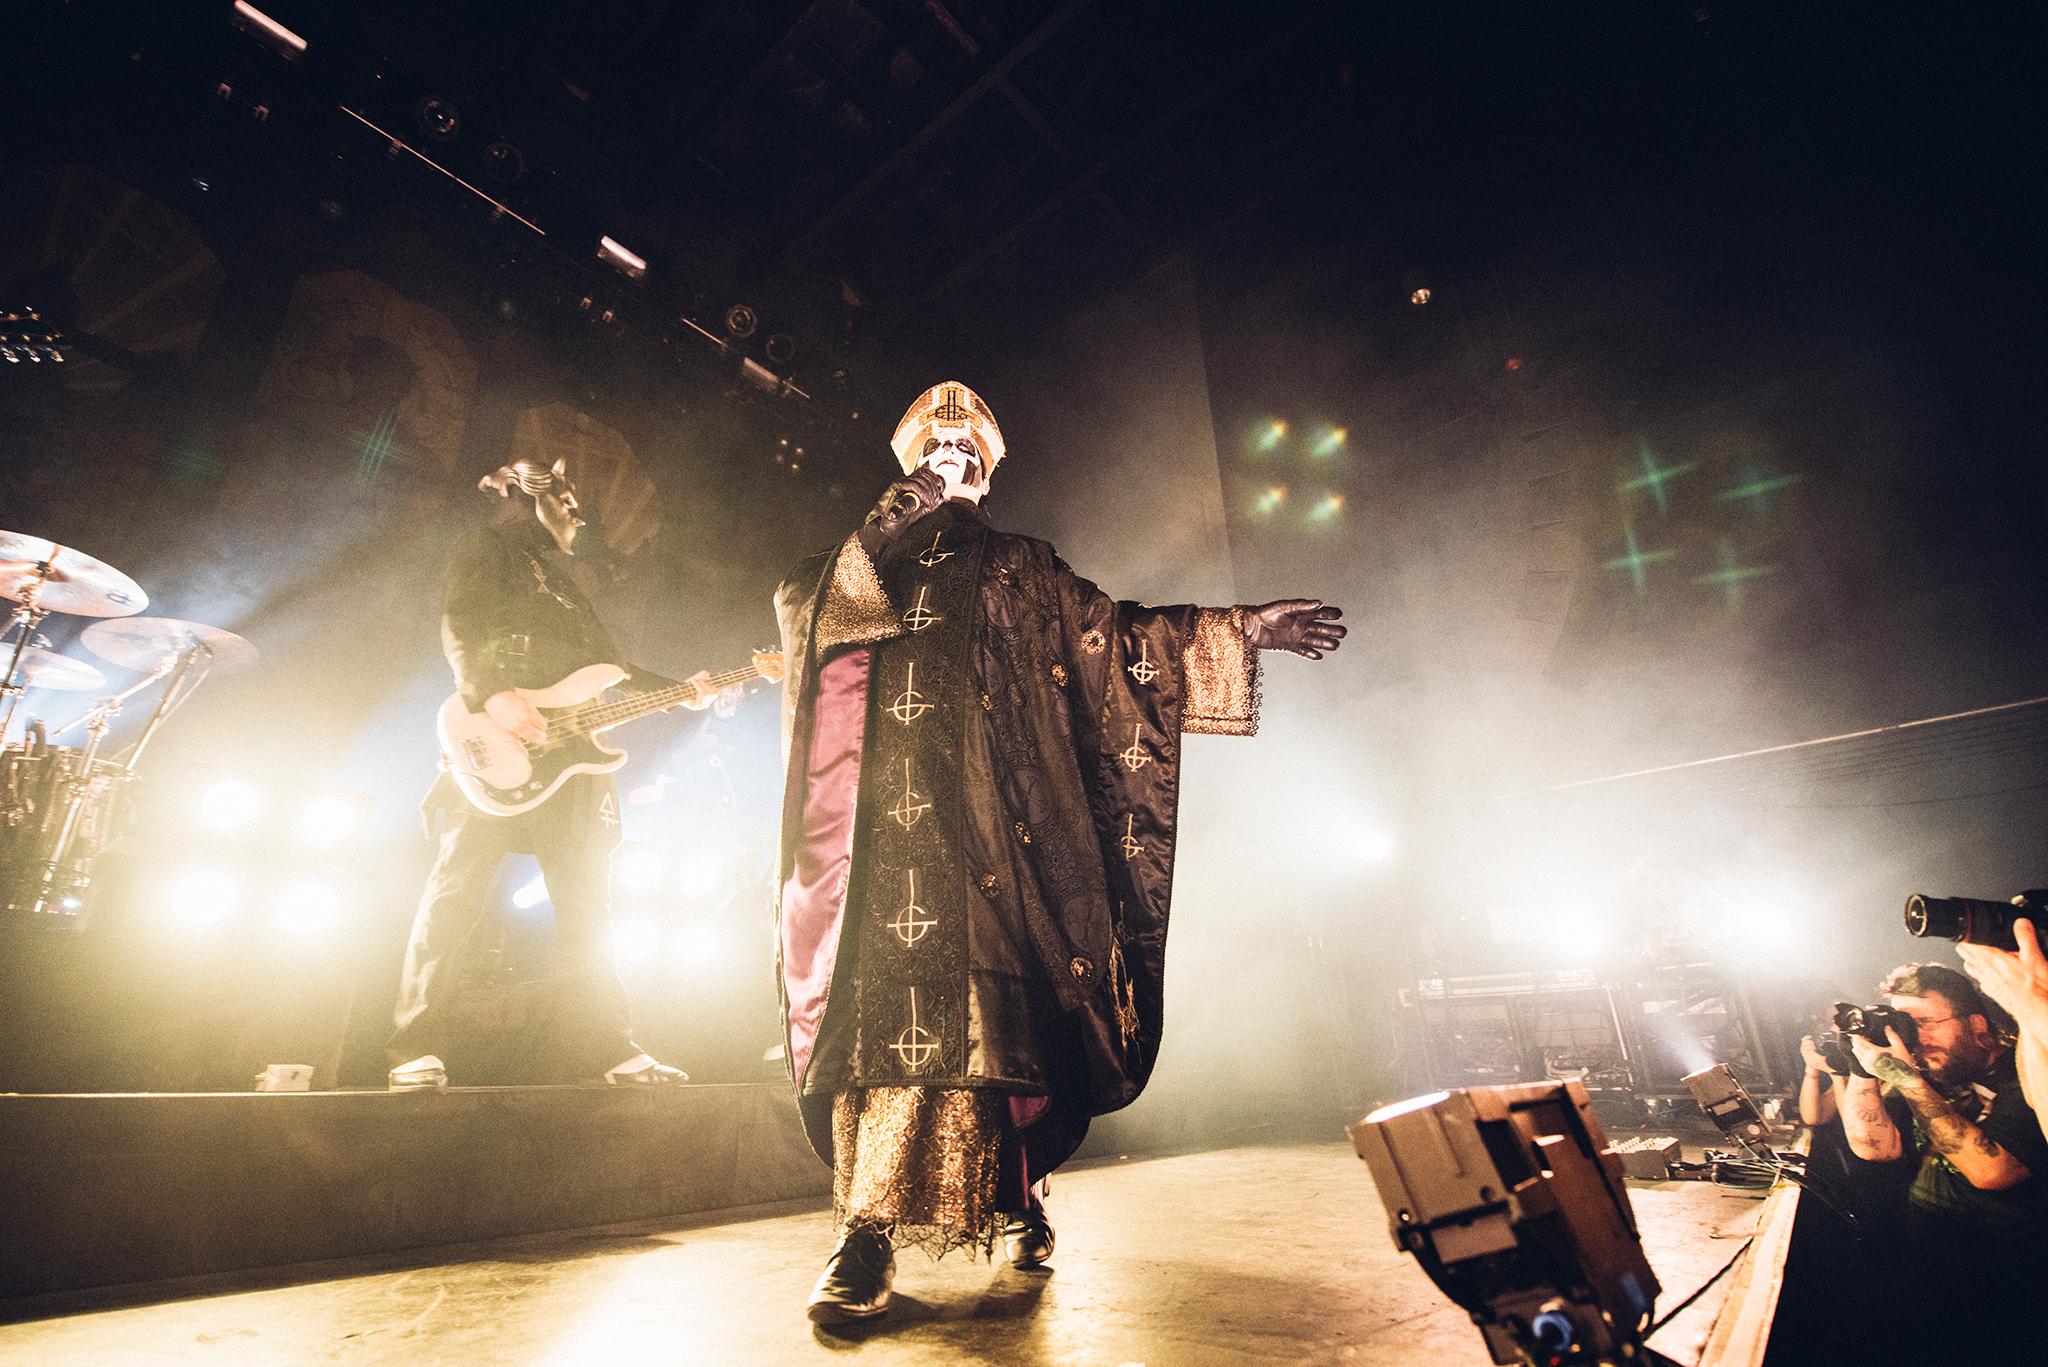 Ghost-Emos-Concert-Photography-Katrina-Barber-4.jpg